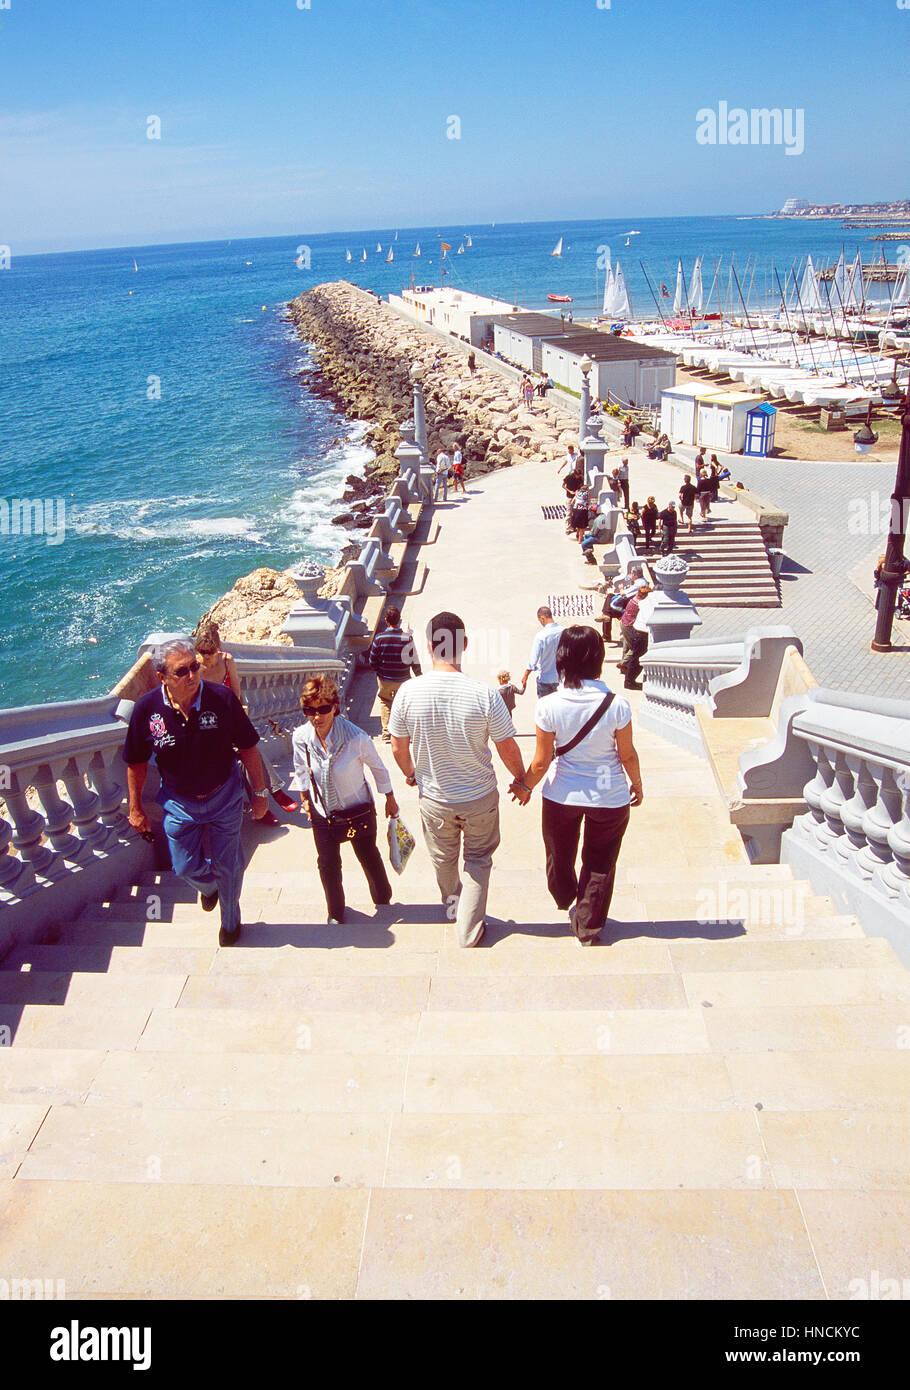 Escalera de acceso al paseo marítimo. Sitges, provincia de Barcelona, Cataluña, España. Foto de stock